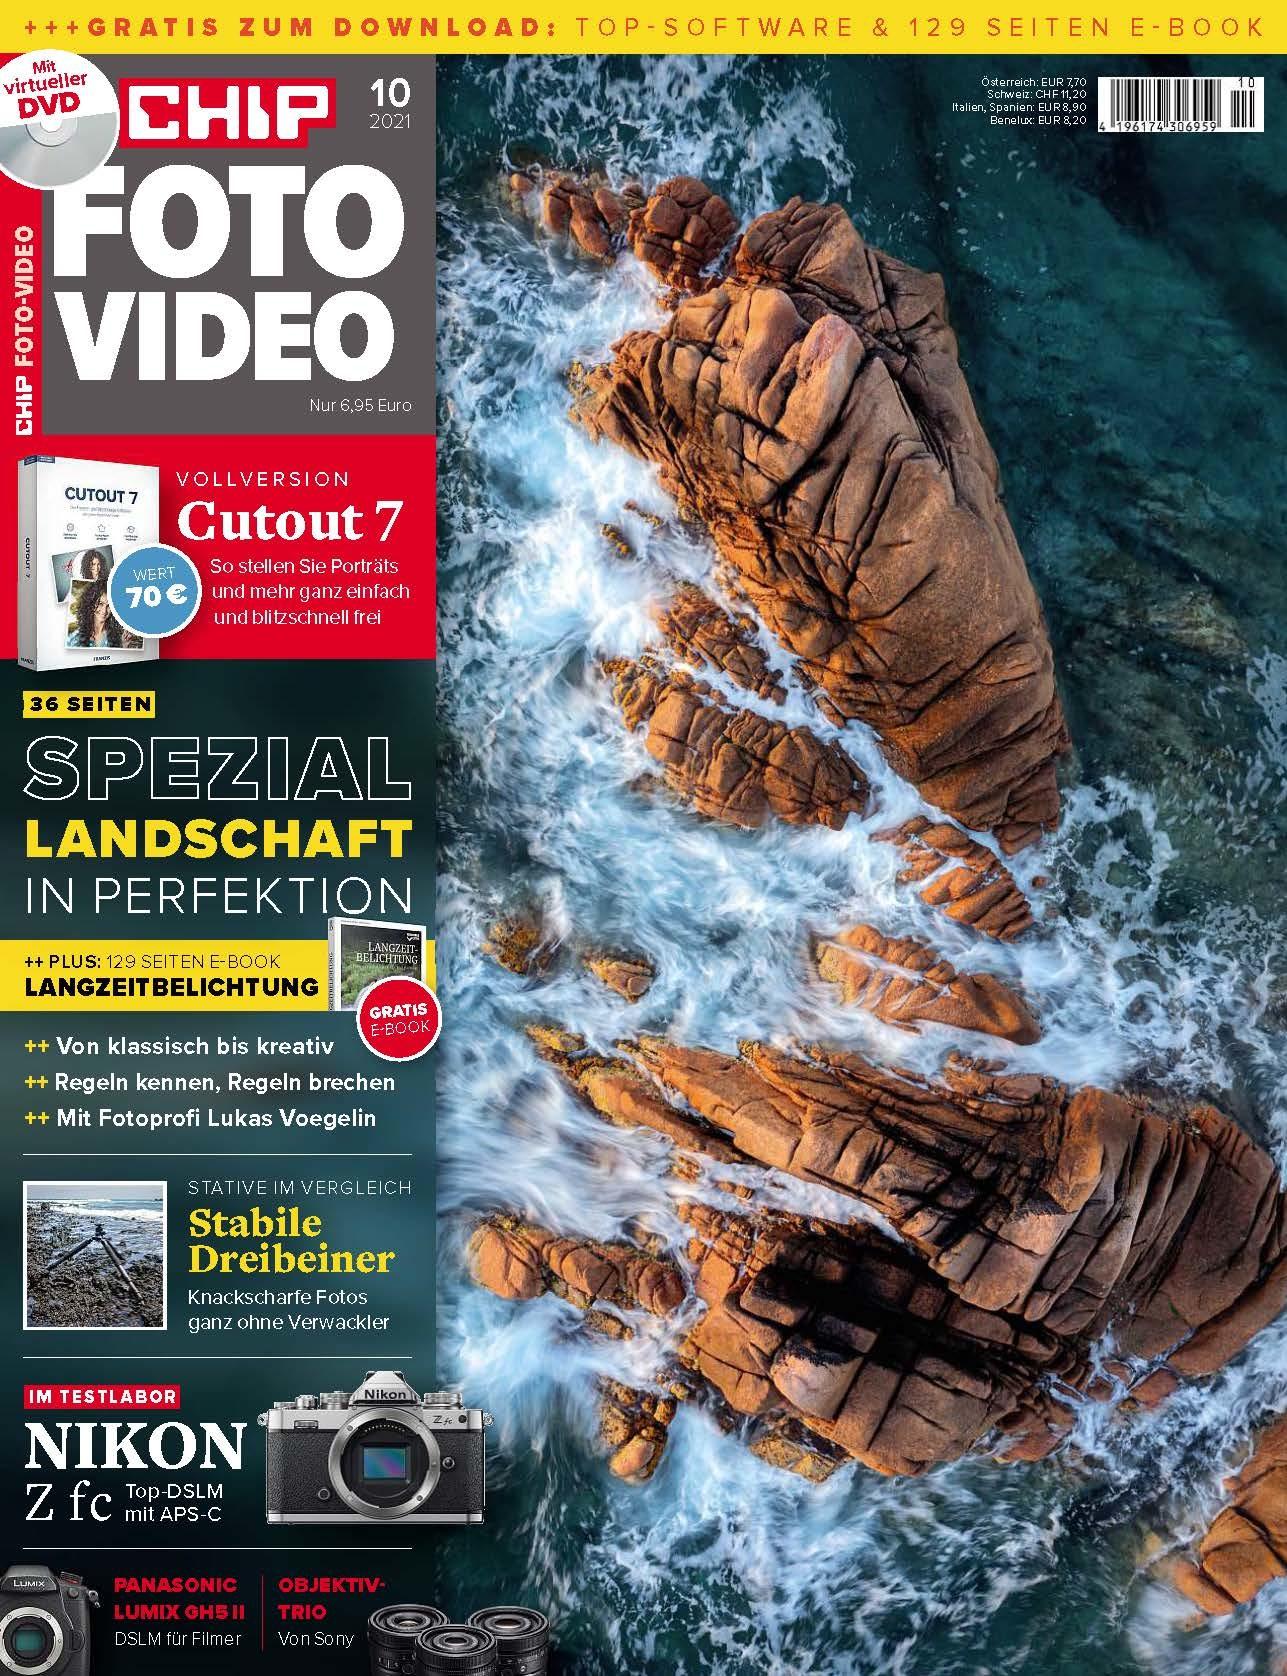 CHIP CHIP FOTO-VIDEO –  Landschaft in Perfektion